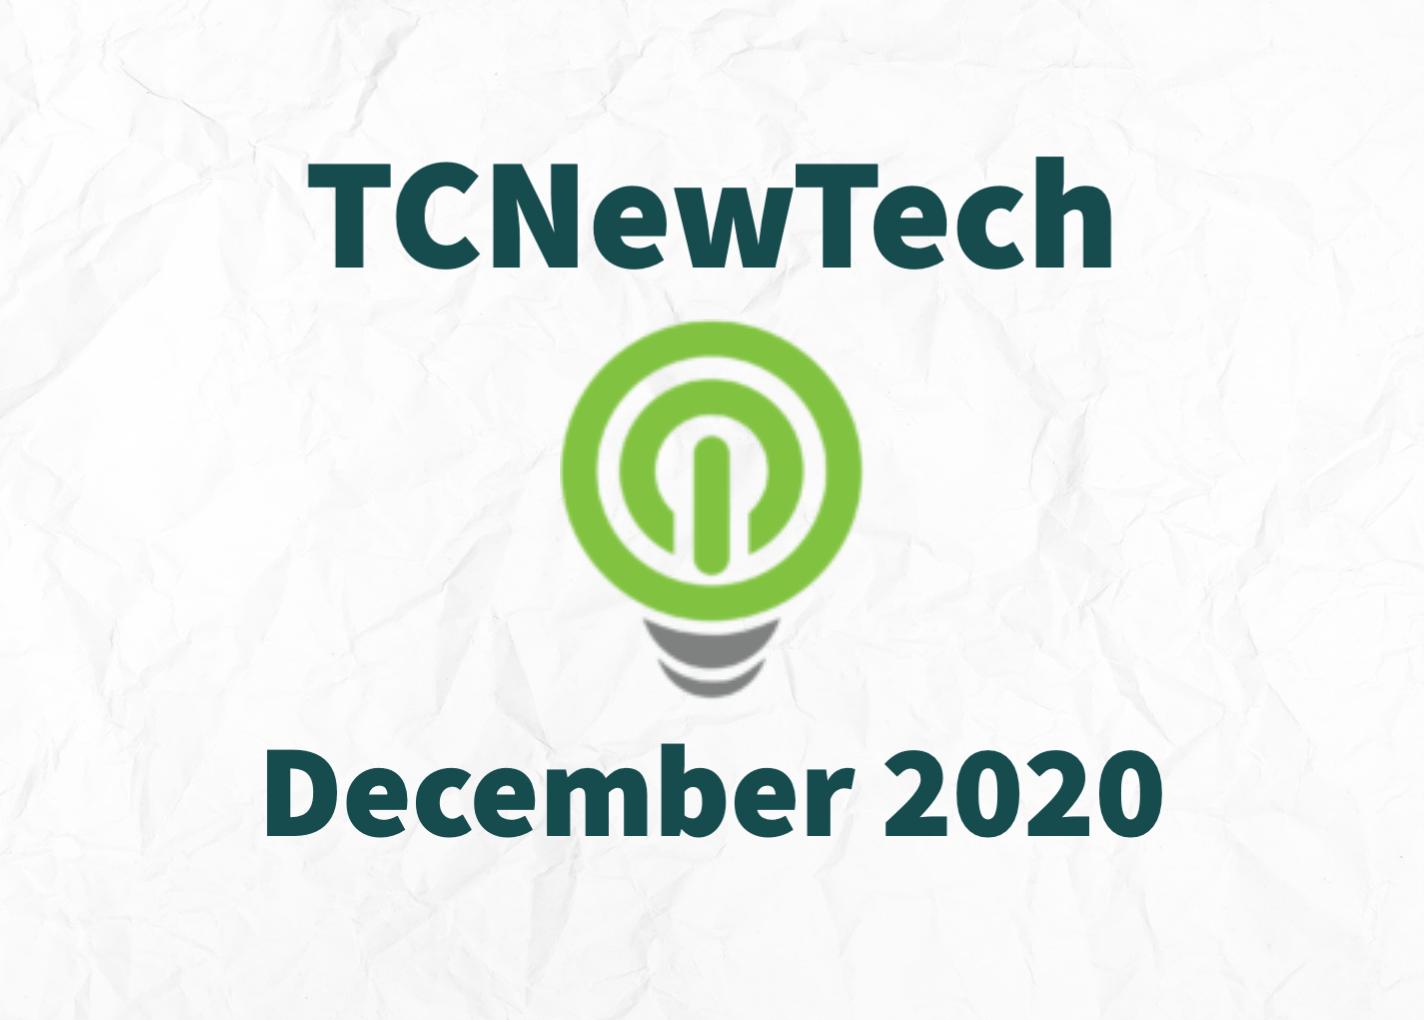 TCNewTech Pitch Contest December 2020